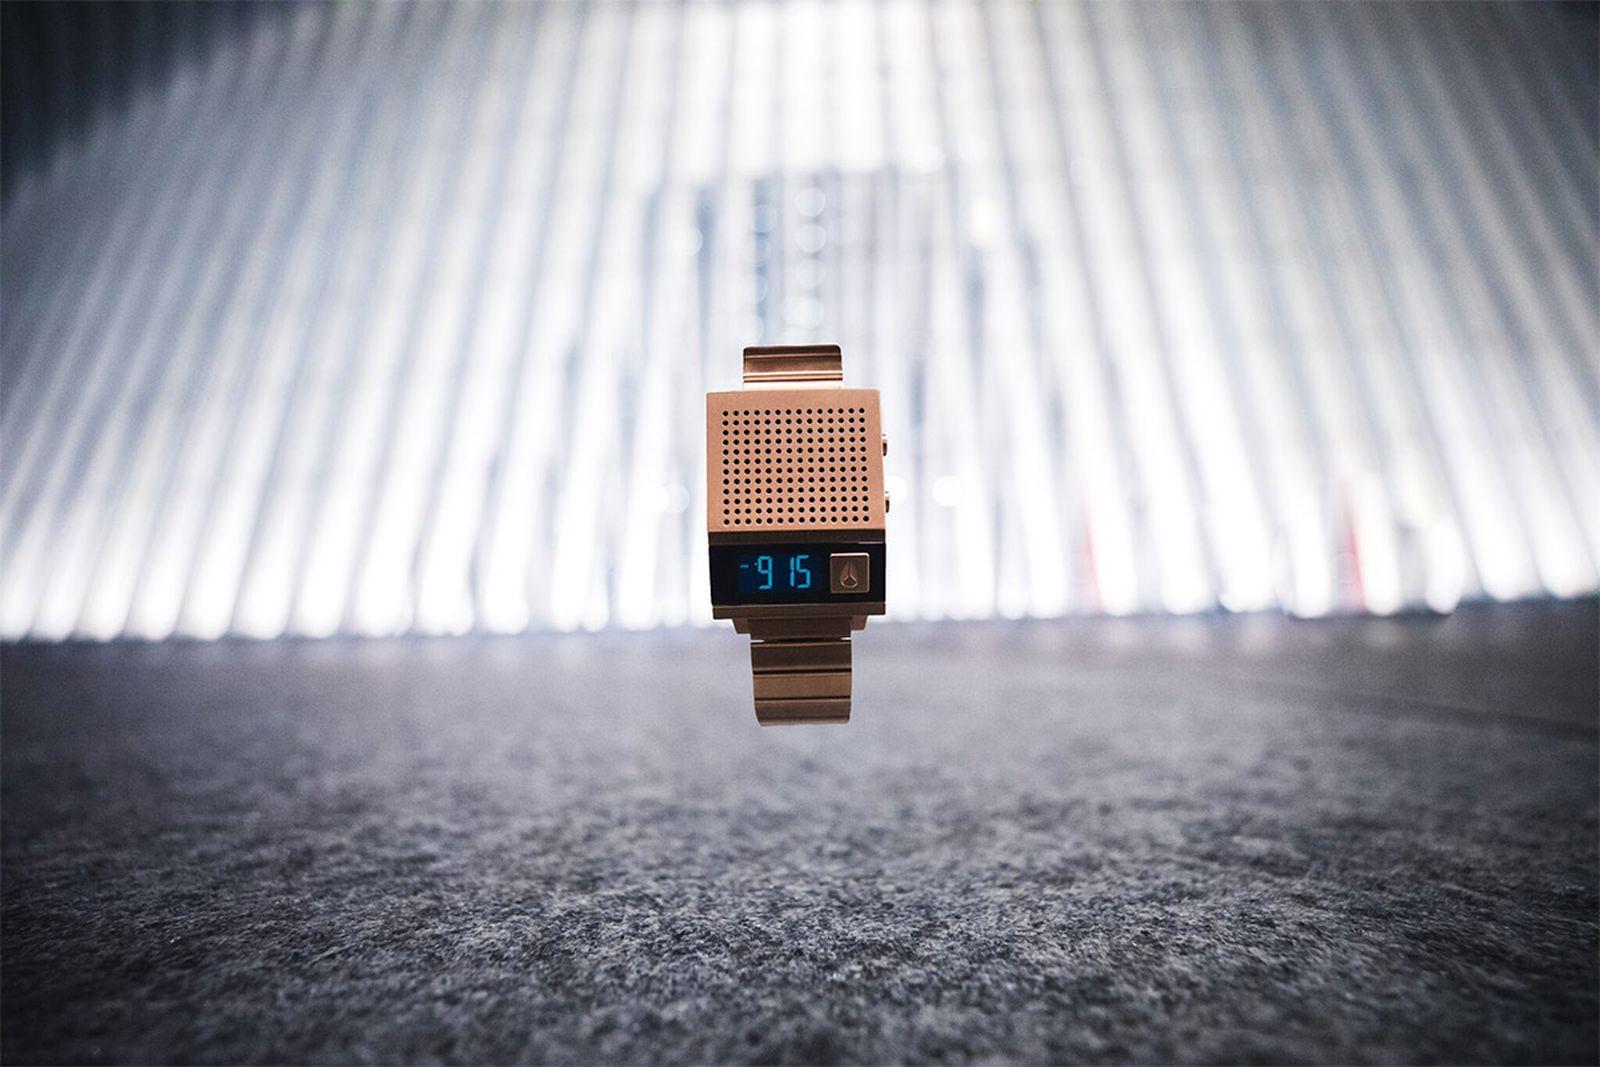 nixon dork too digital watches